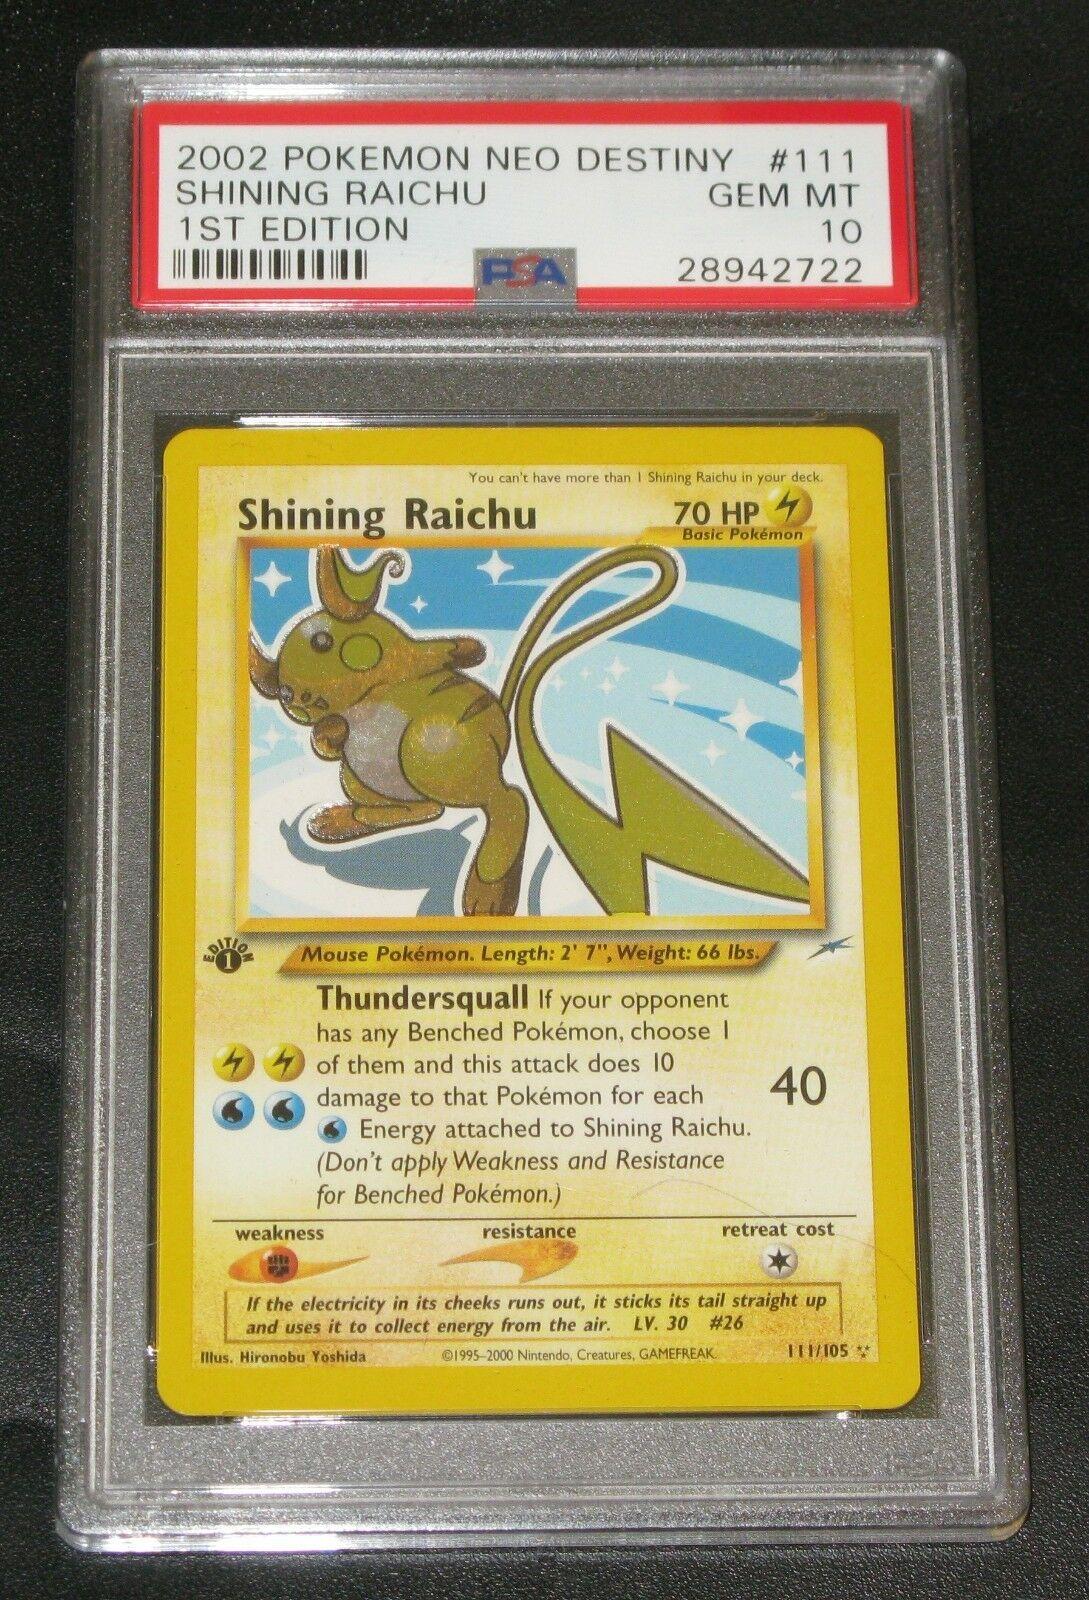 Pokemon Card  PSA 10 1st Edition Shining Raichu  Neo Destiny 111105